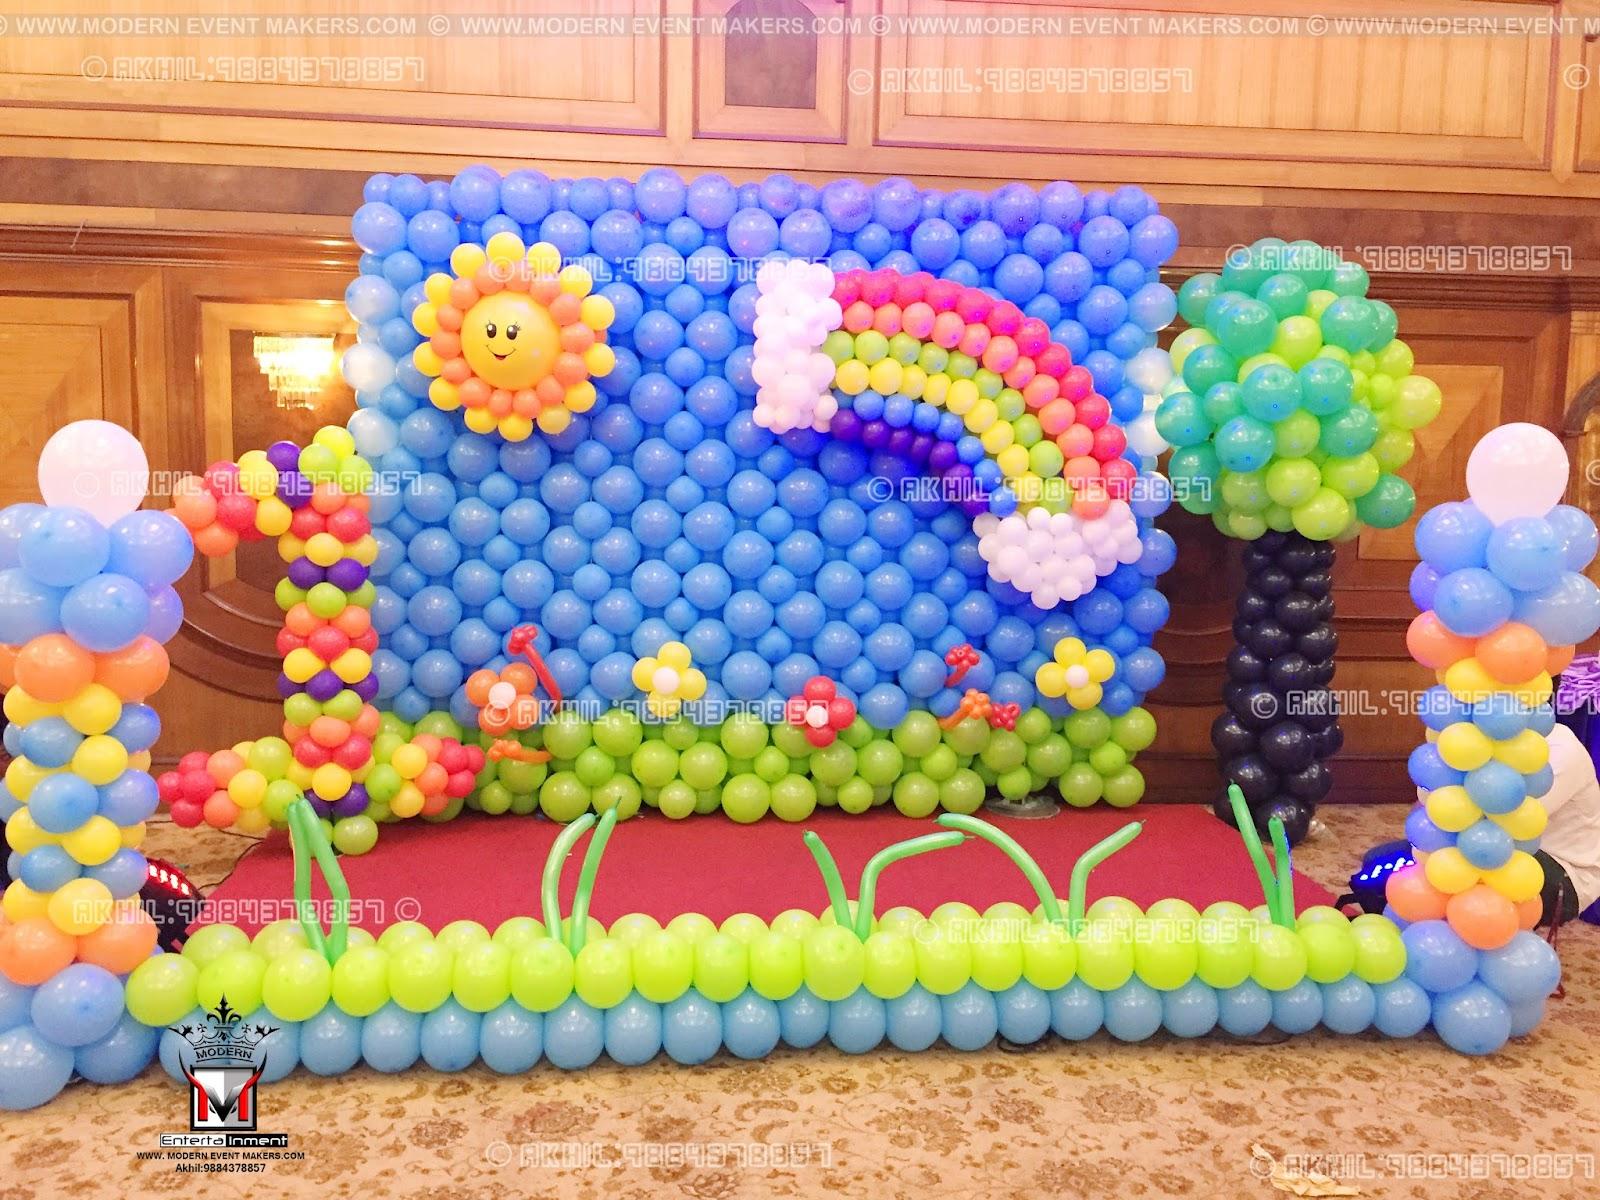 Event Management Company Balloon Decoration Modern